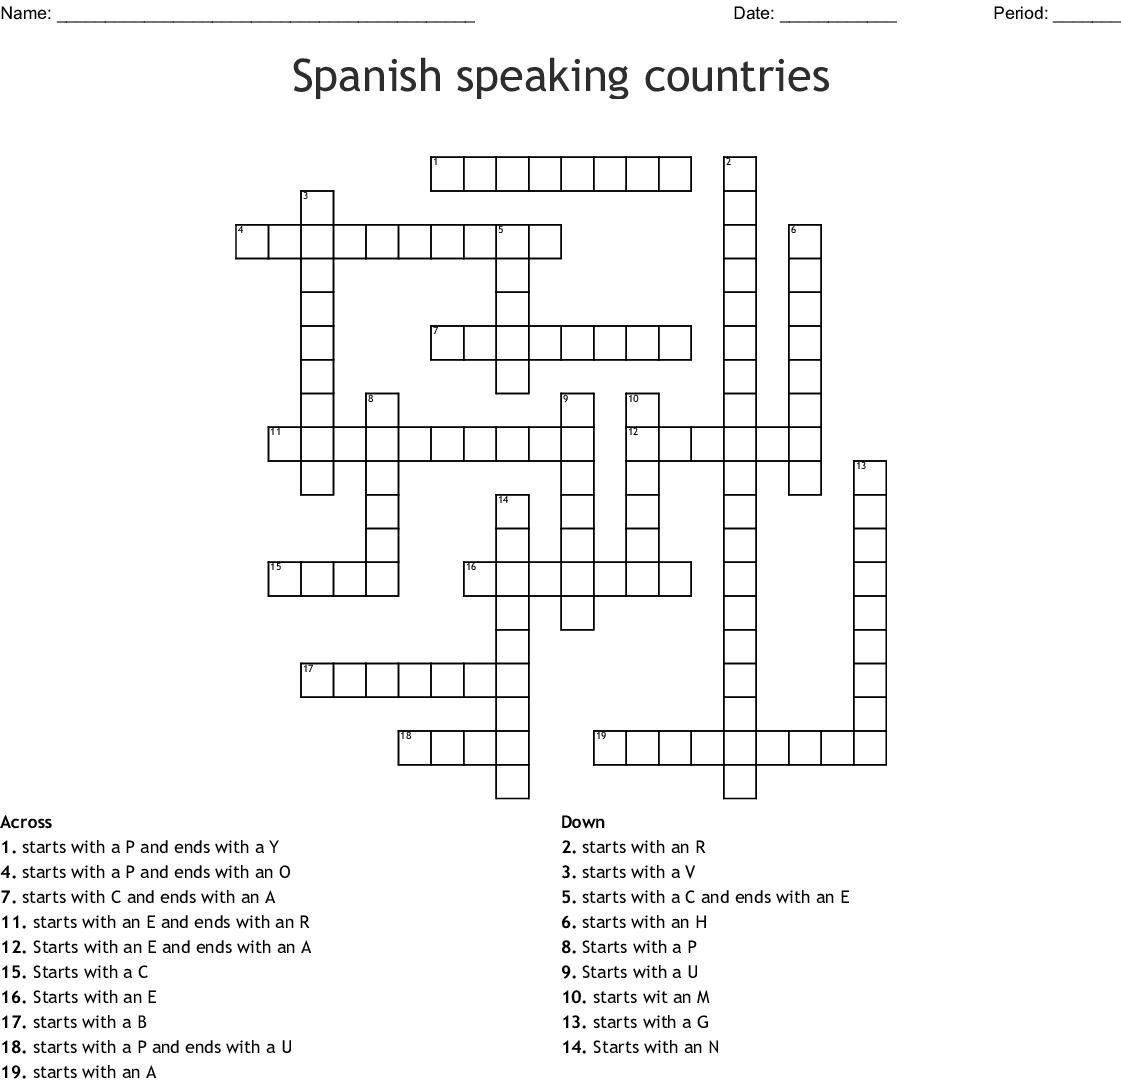 Spanish Speaking Countries Crossword Word